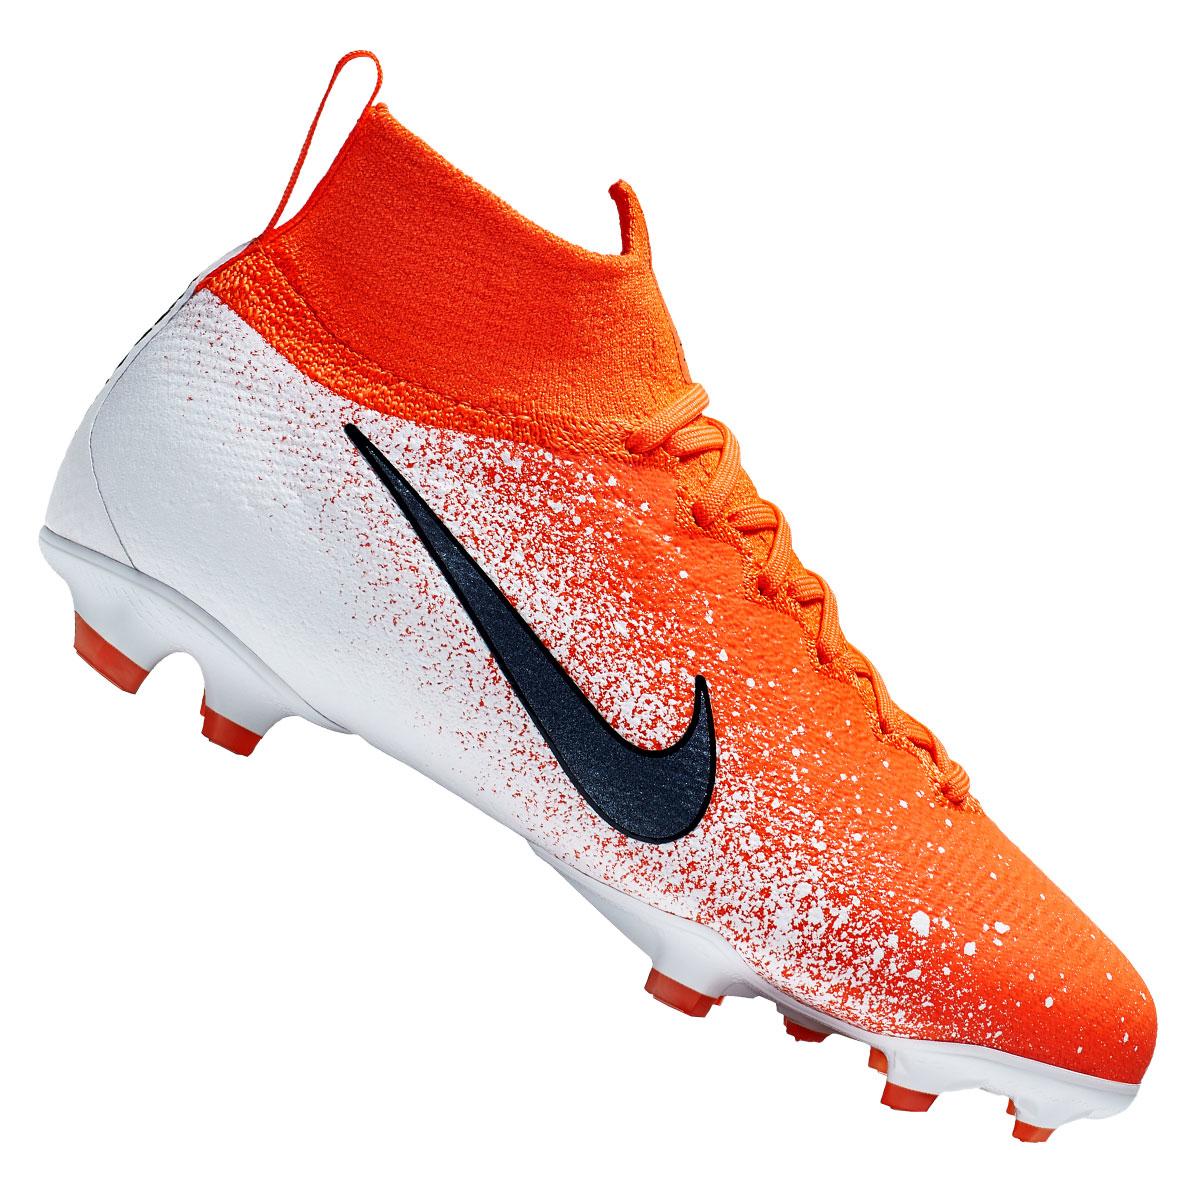 Nike Kinder Fussballschuh Mercurial Superfly Vi Jr Elite Fg Orange Weiss